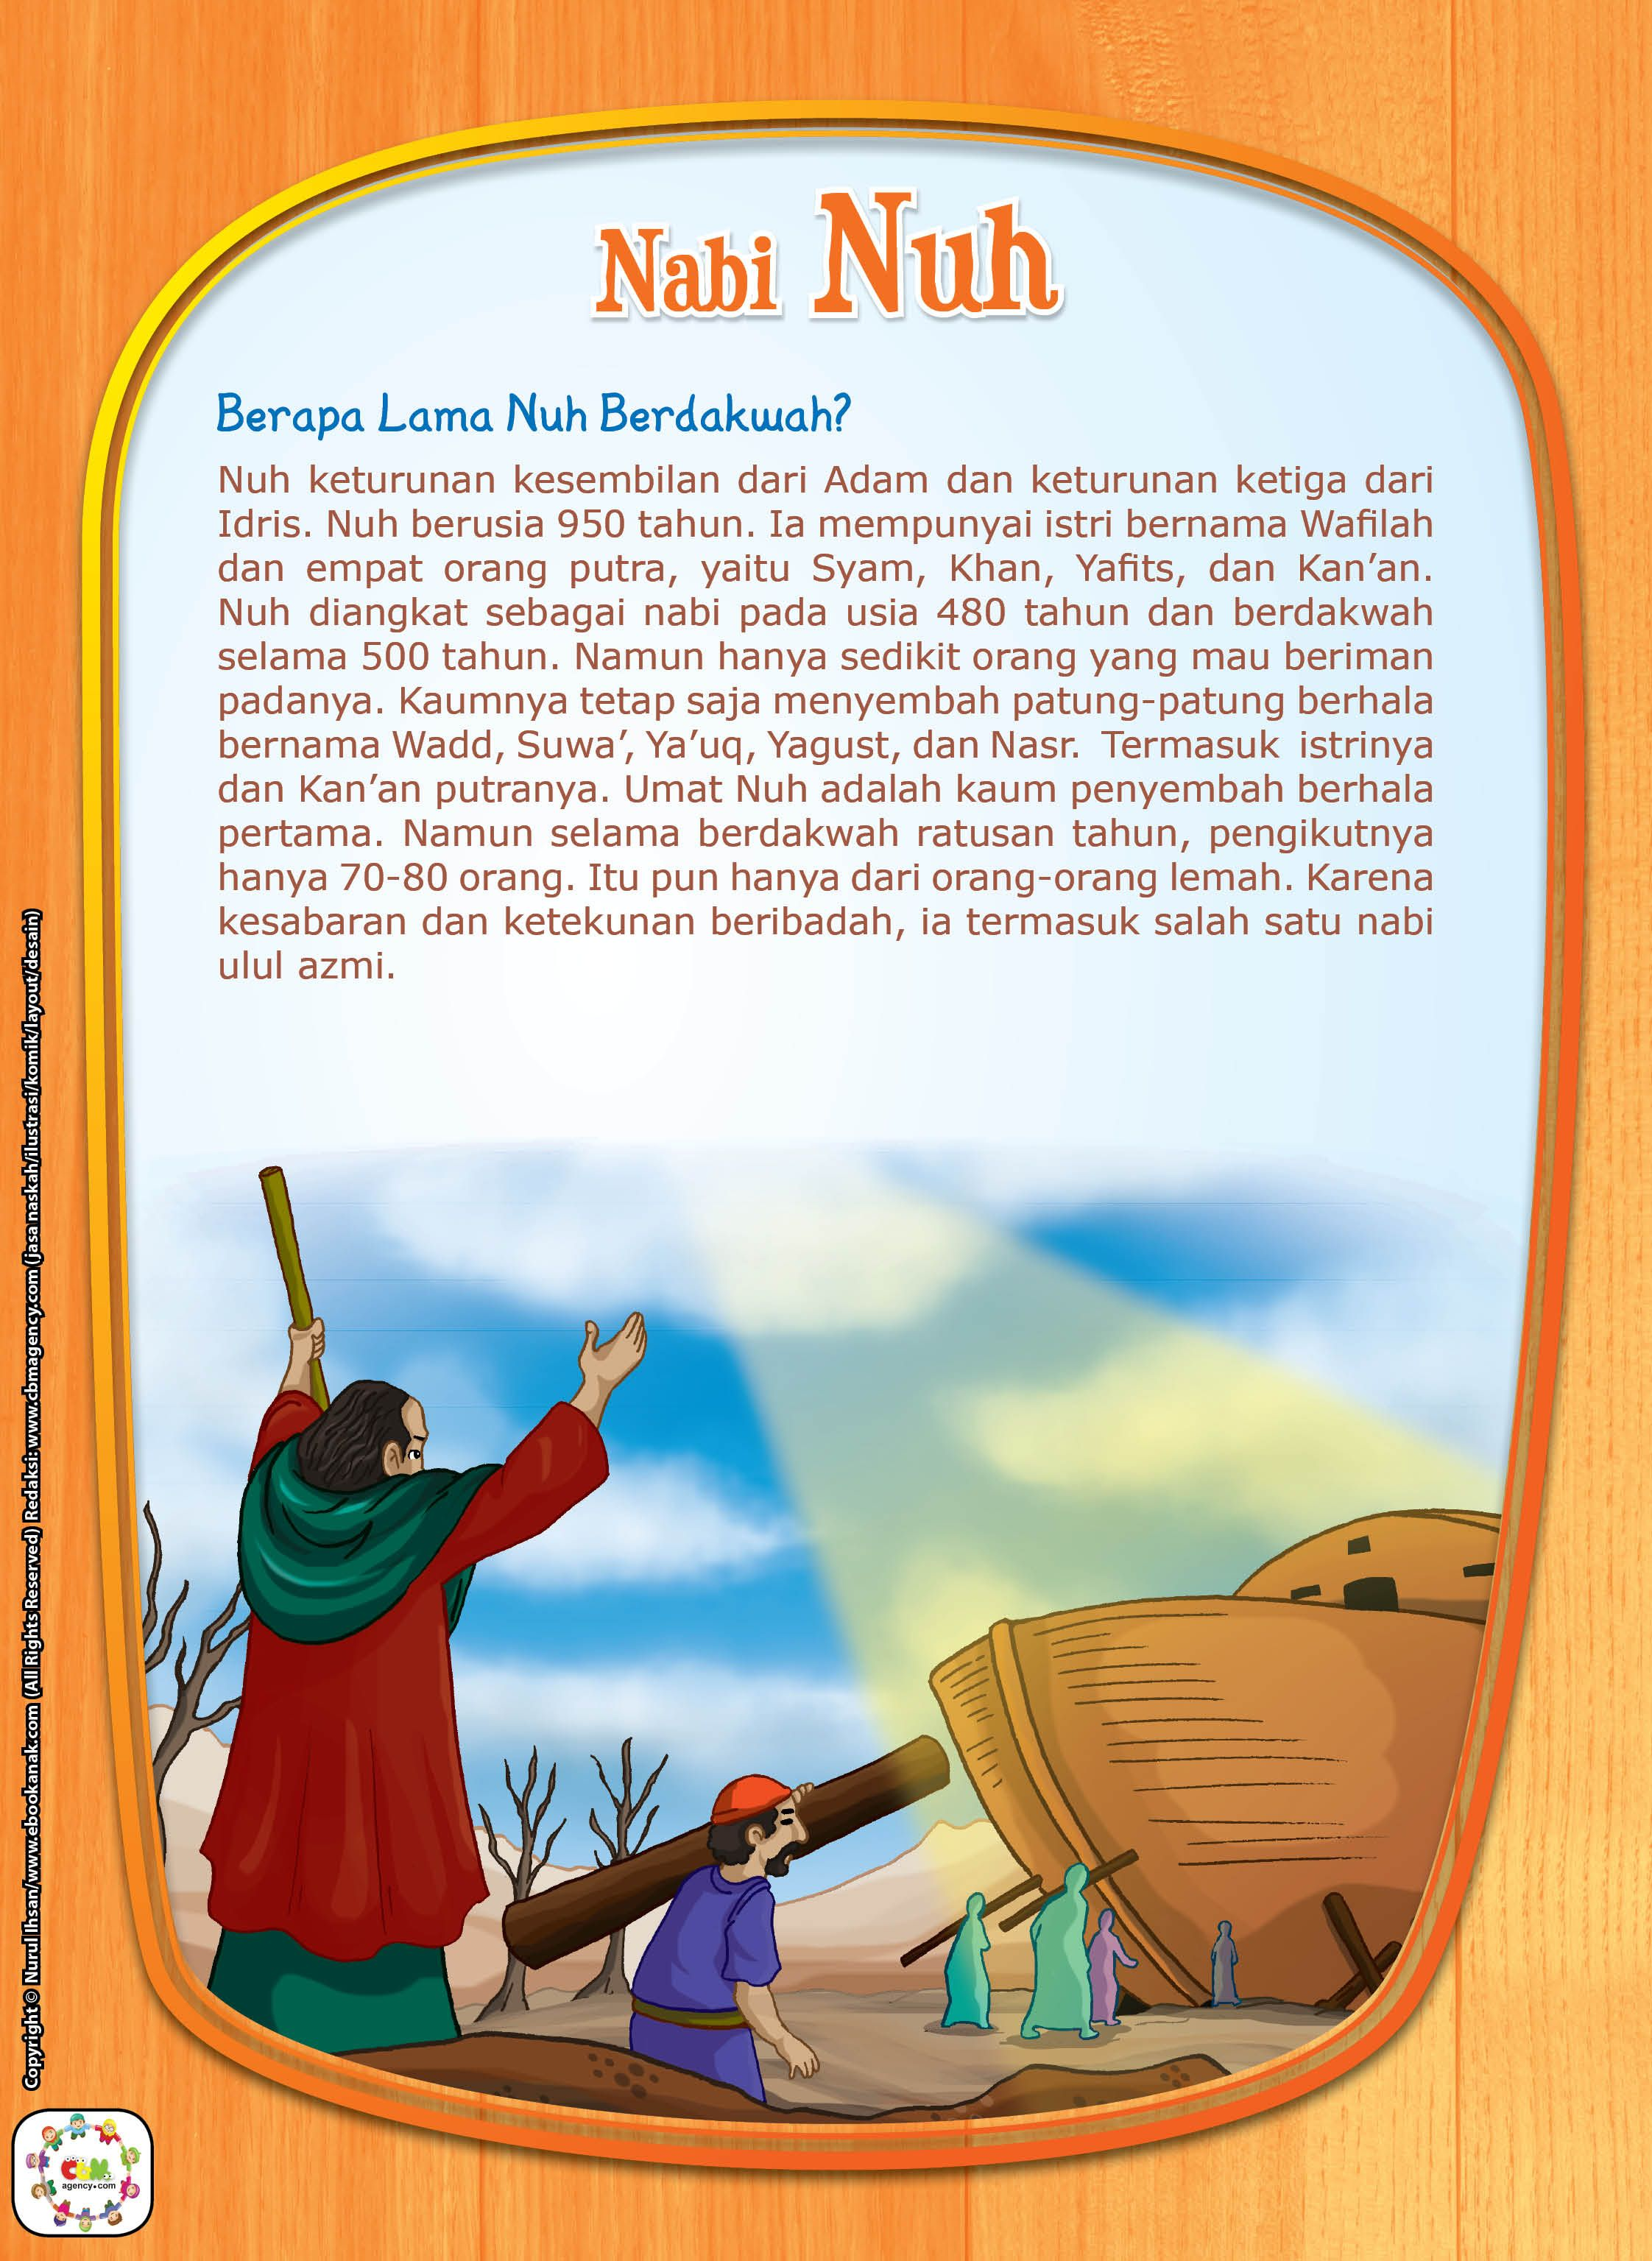 Berapa Lama Nabi Nuh Berdakwah Pendidikan Belajar Buku